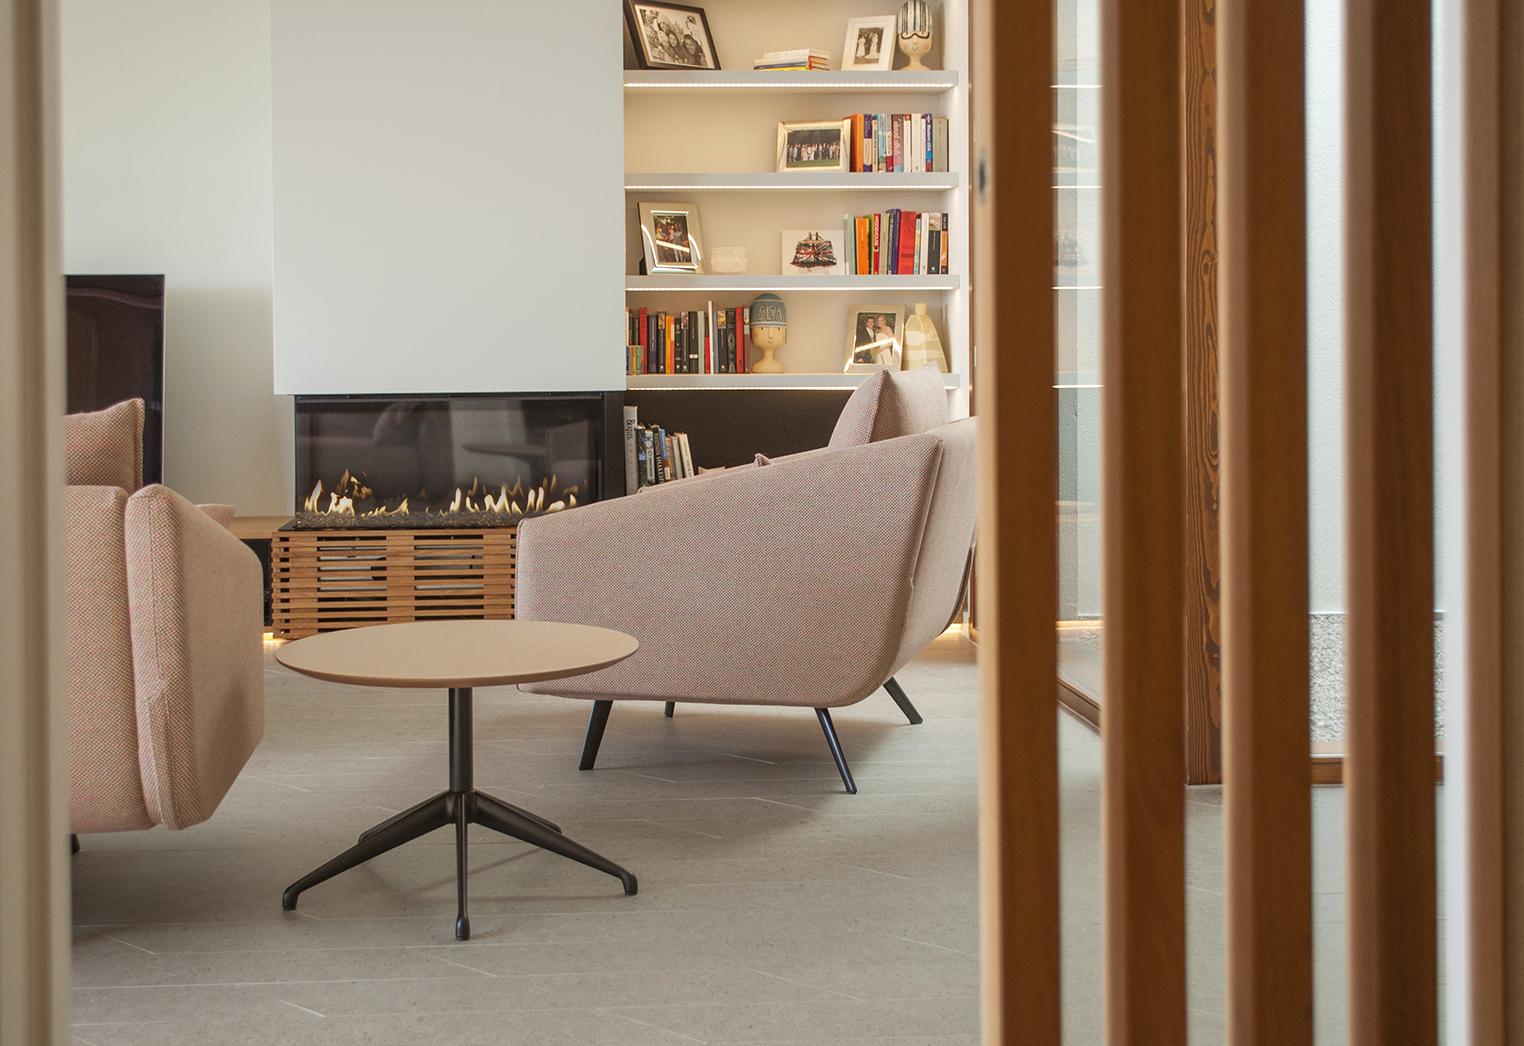 4 Architecture Sitges Interior Design Barcelona Living Room